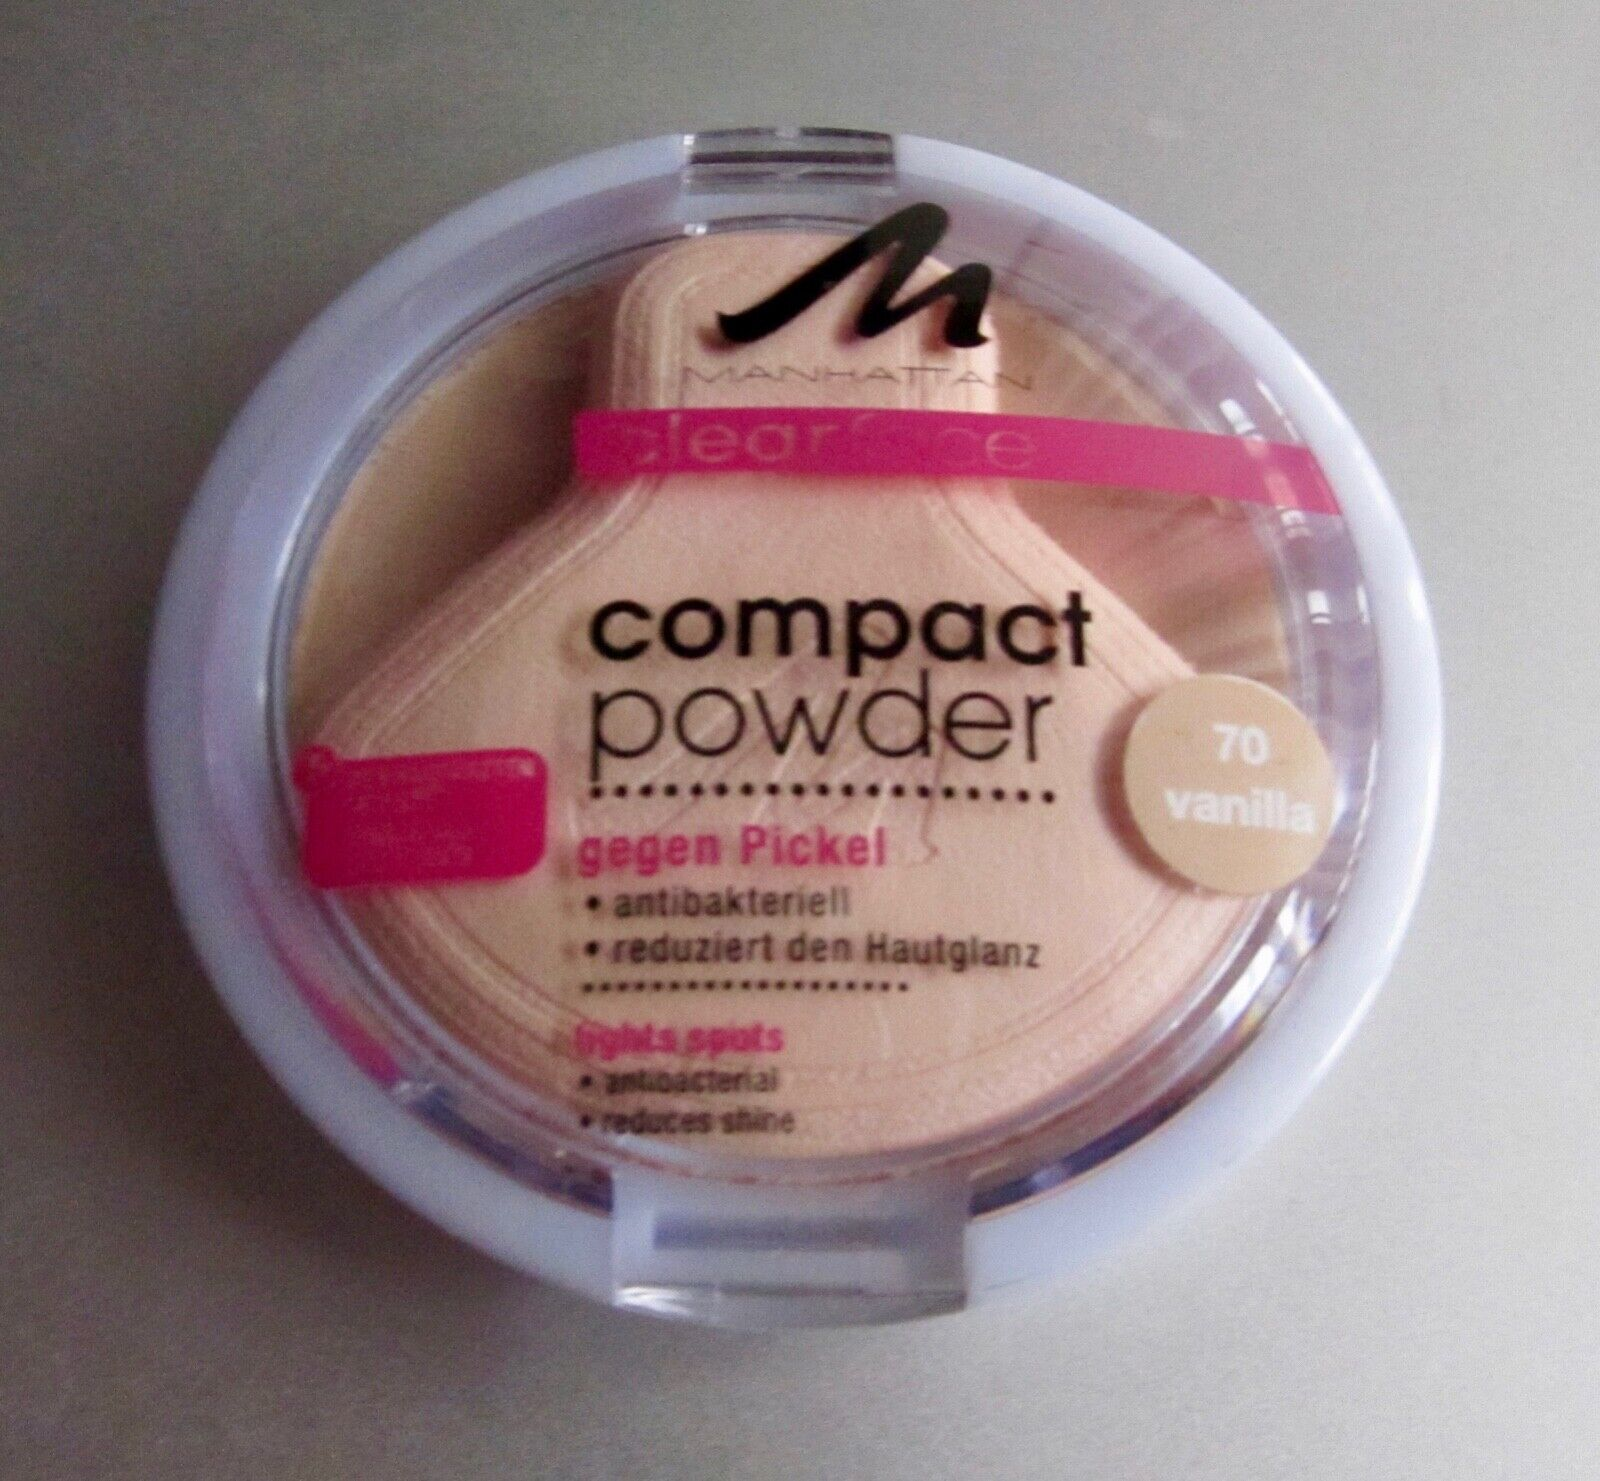 Manhattan Clearface Compact Powder 70 Vanilla * Puder Make-up antibakteriell